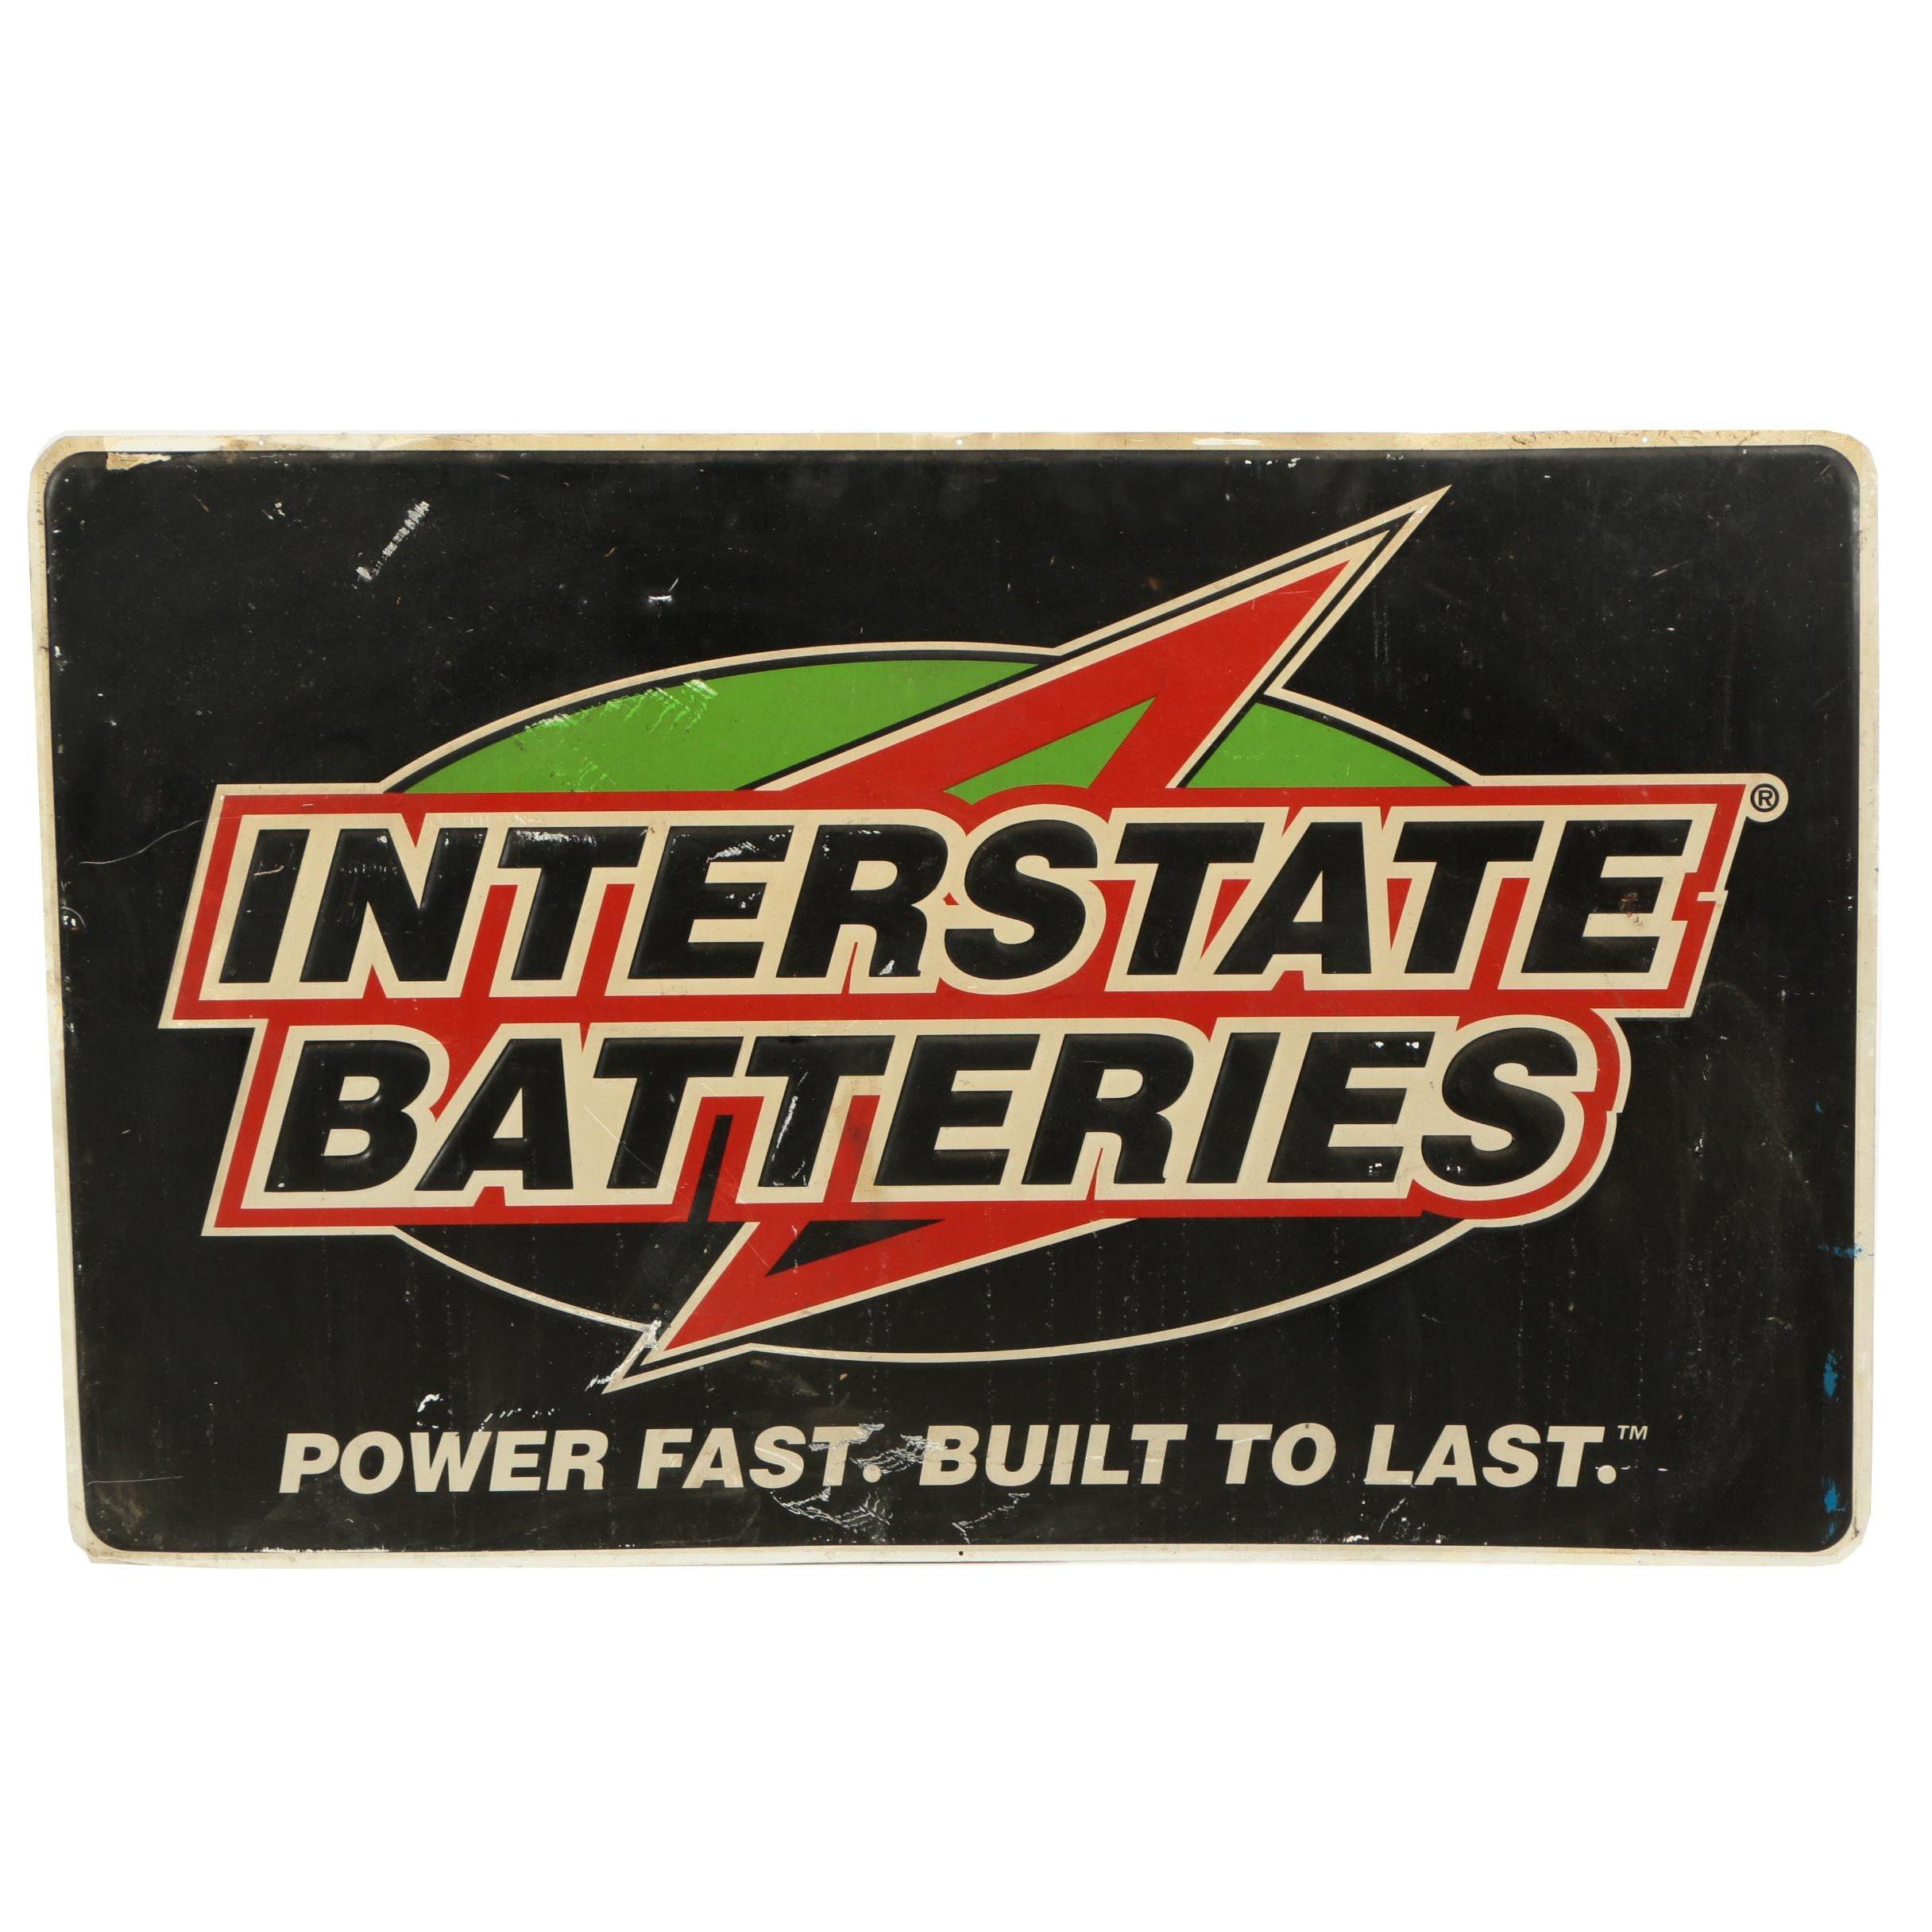 Interstate Batteries Embossed Printed Metal Sign, 20th Century